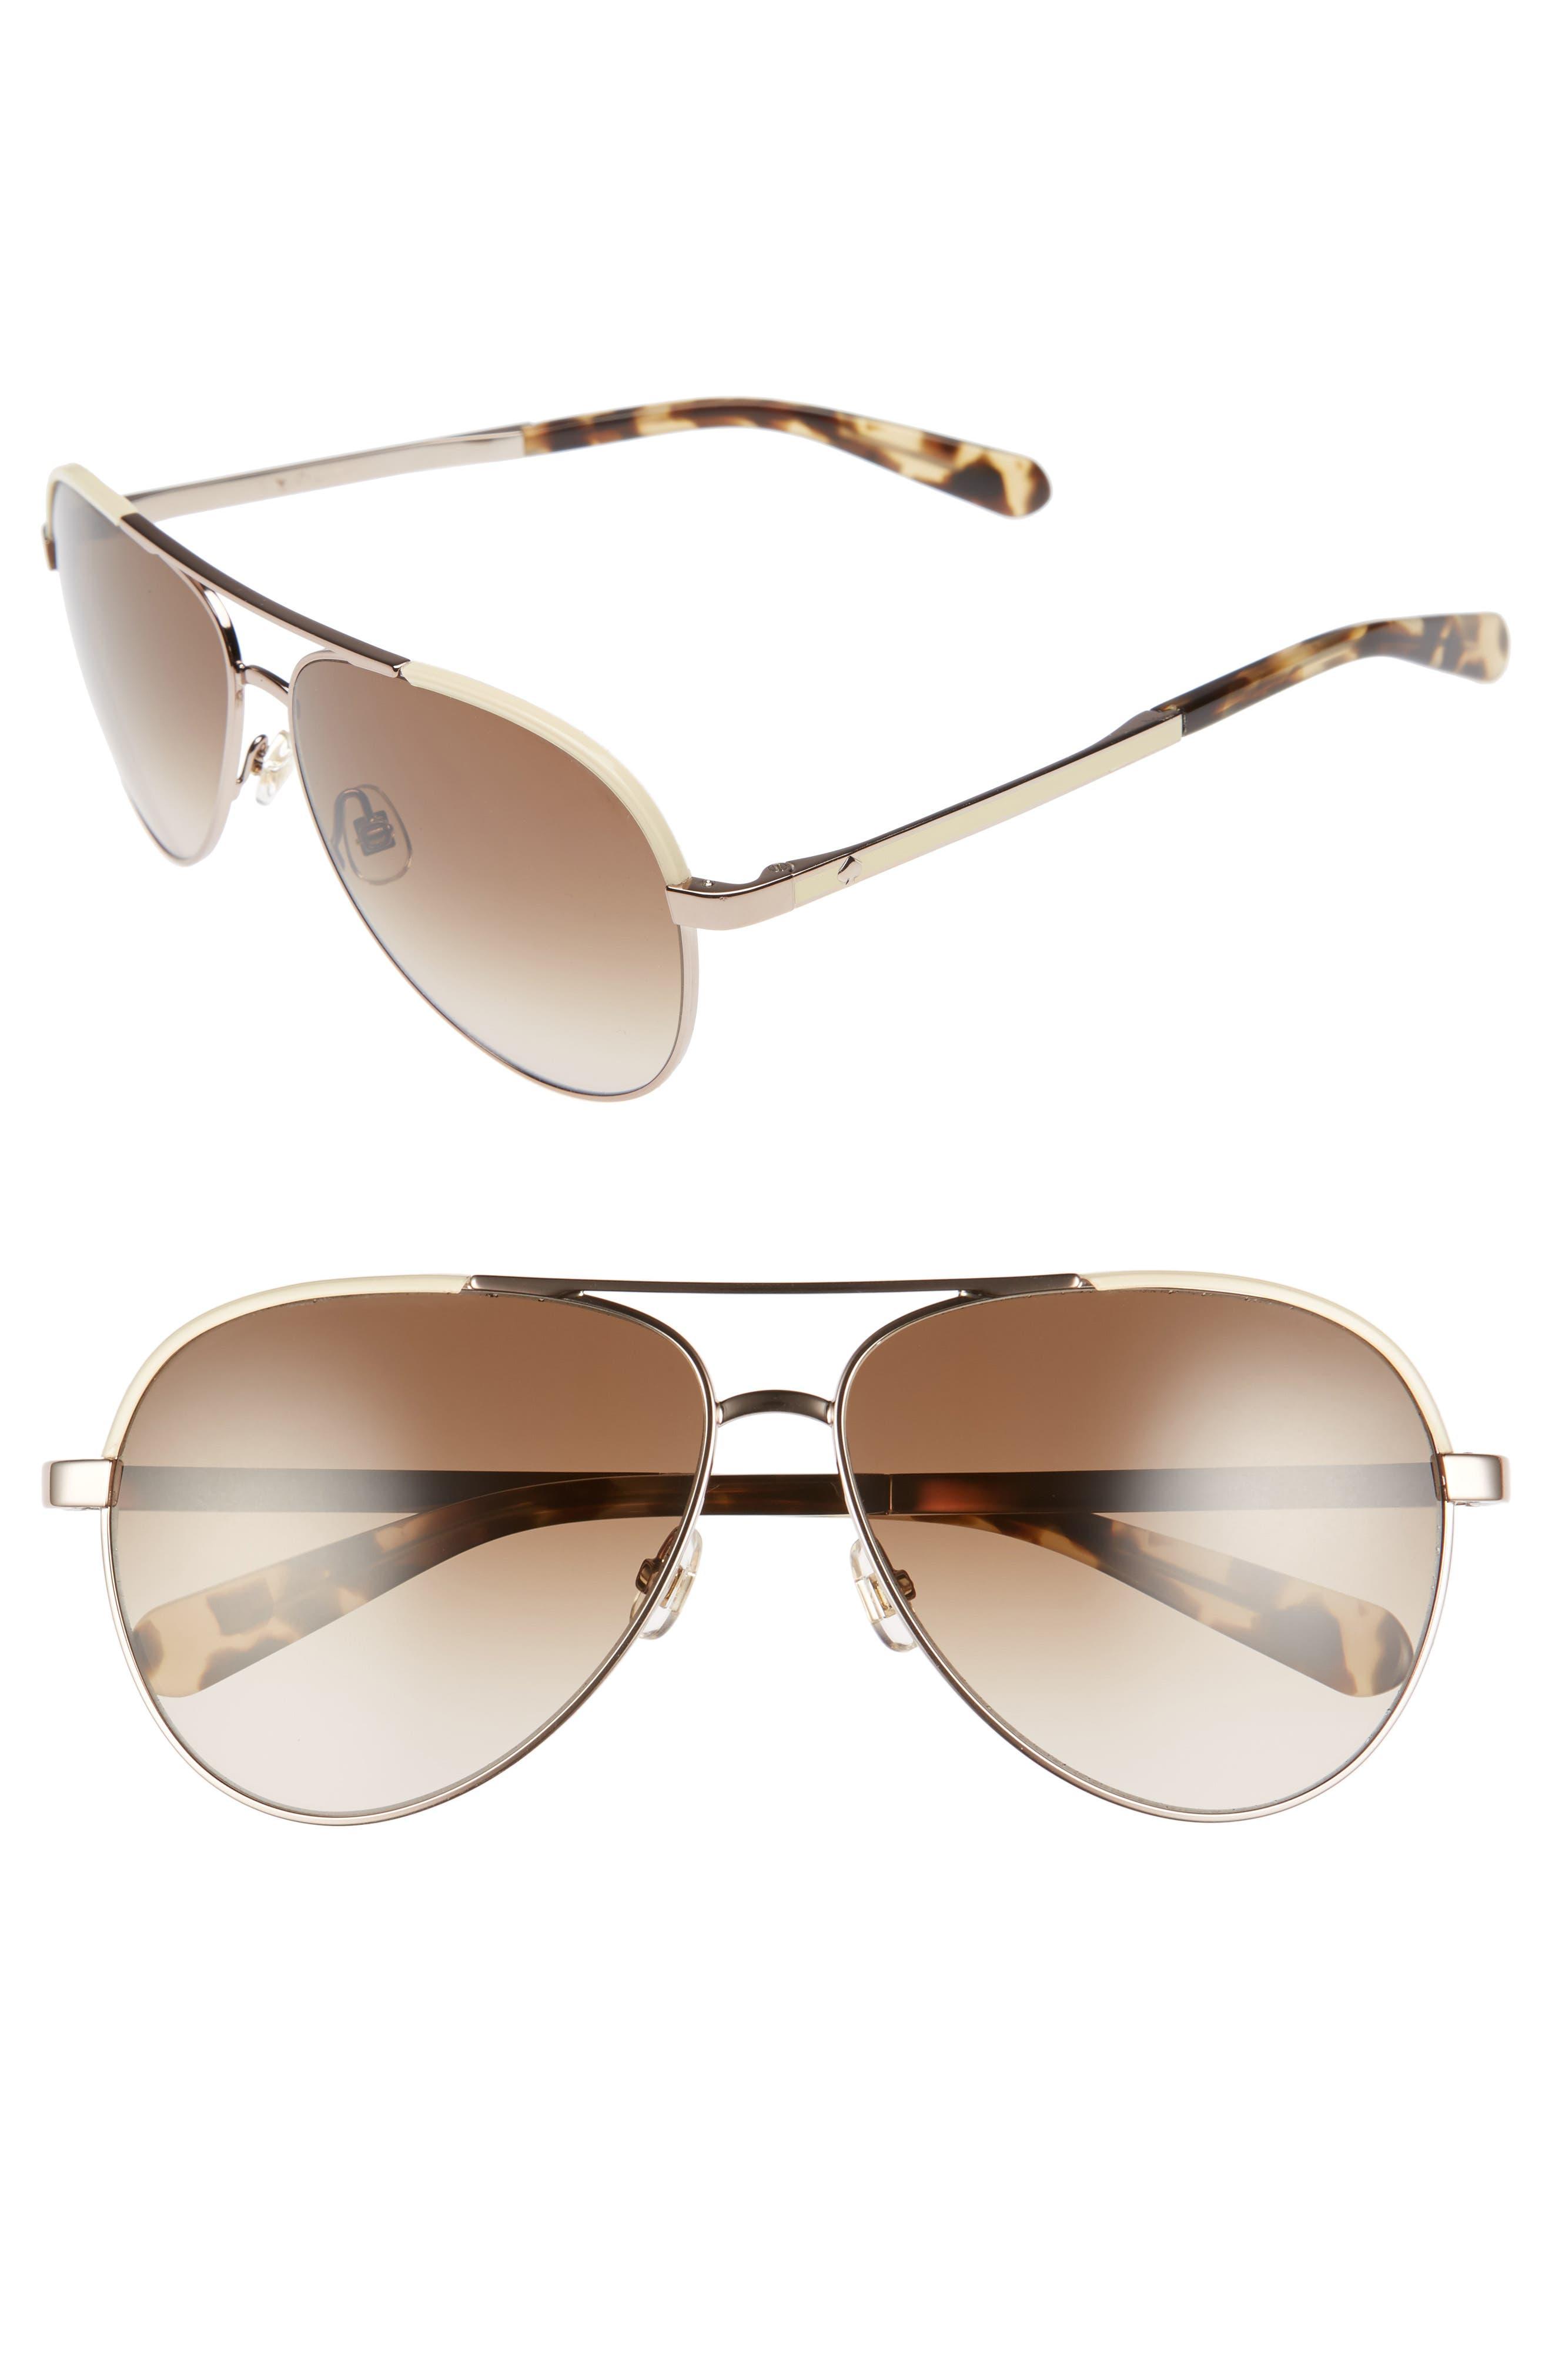 Alternate Image 1 Selected - kate spade new york amarissa 59mm polarized aviator sunglasses